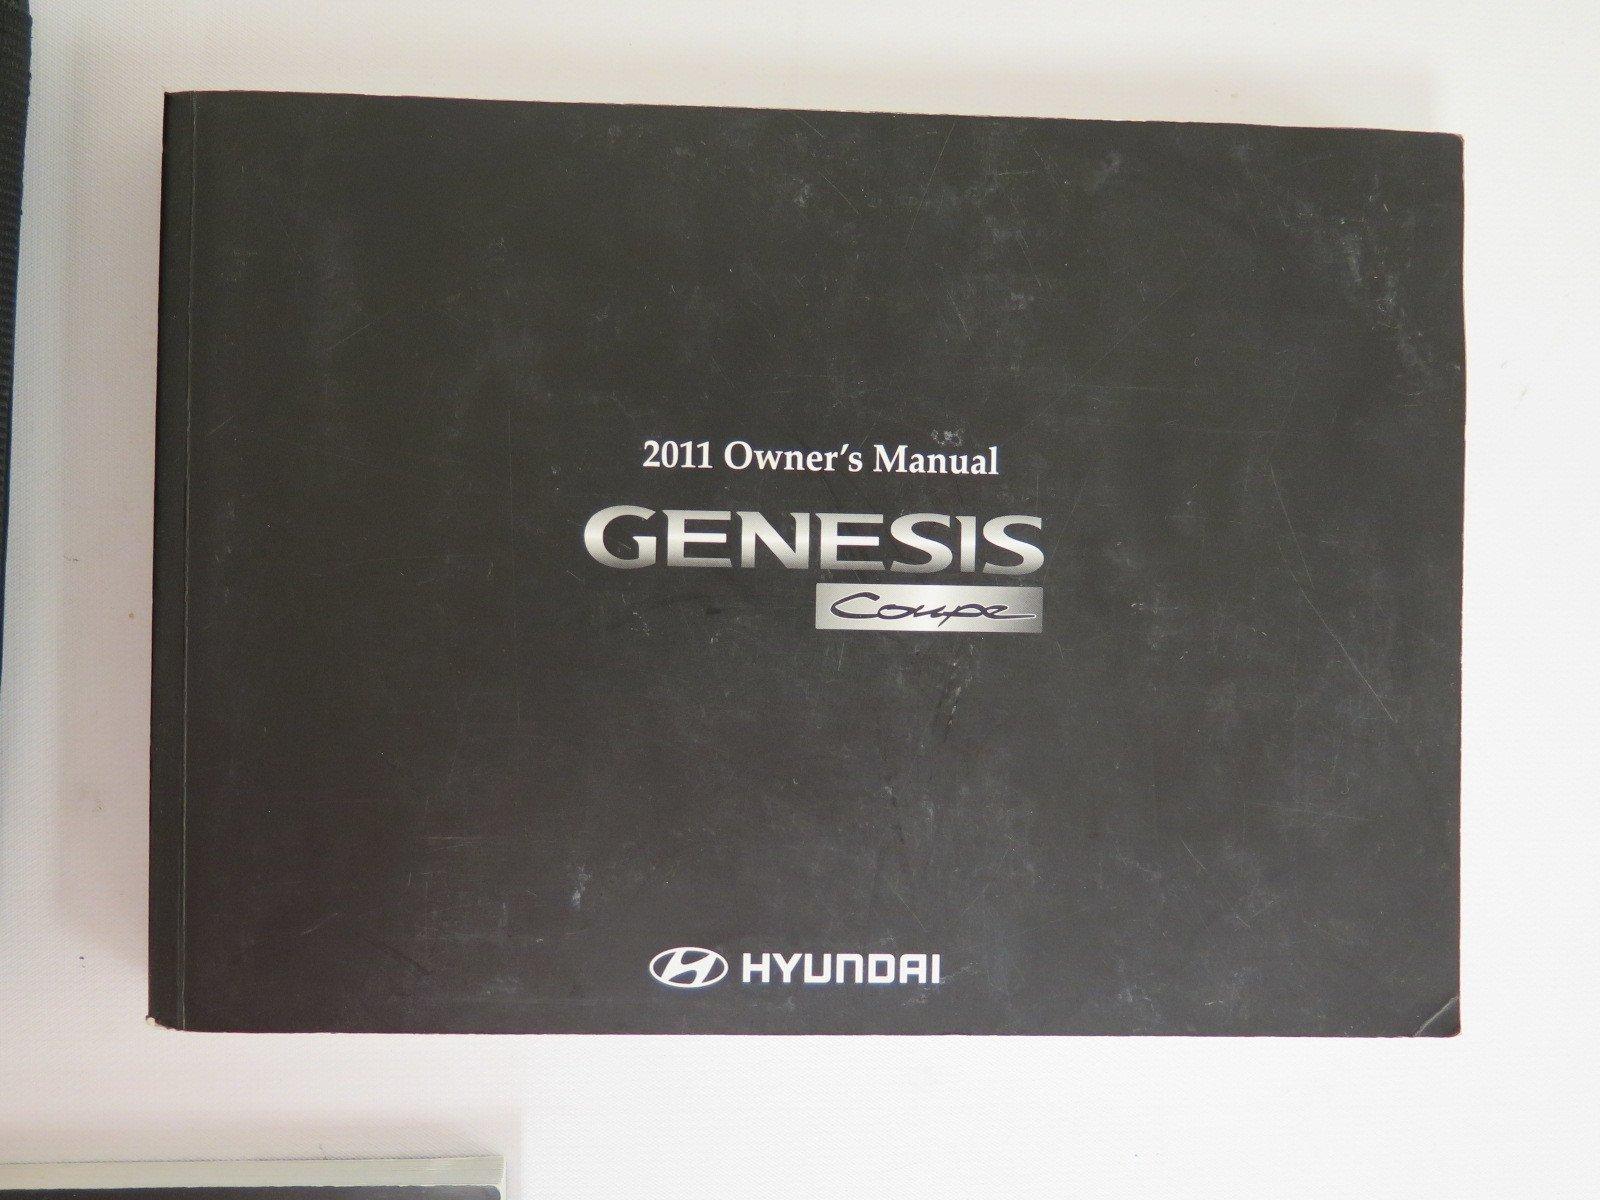 2011 Hyundai Genesis Owners Manual Book: Hyndai Kia Automotive: Amazon.com:  Books